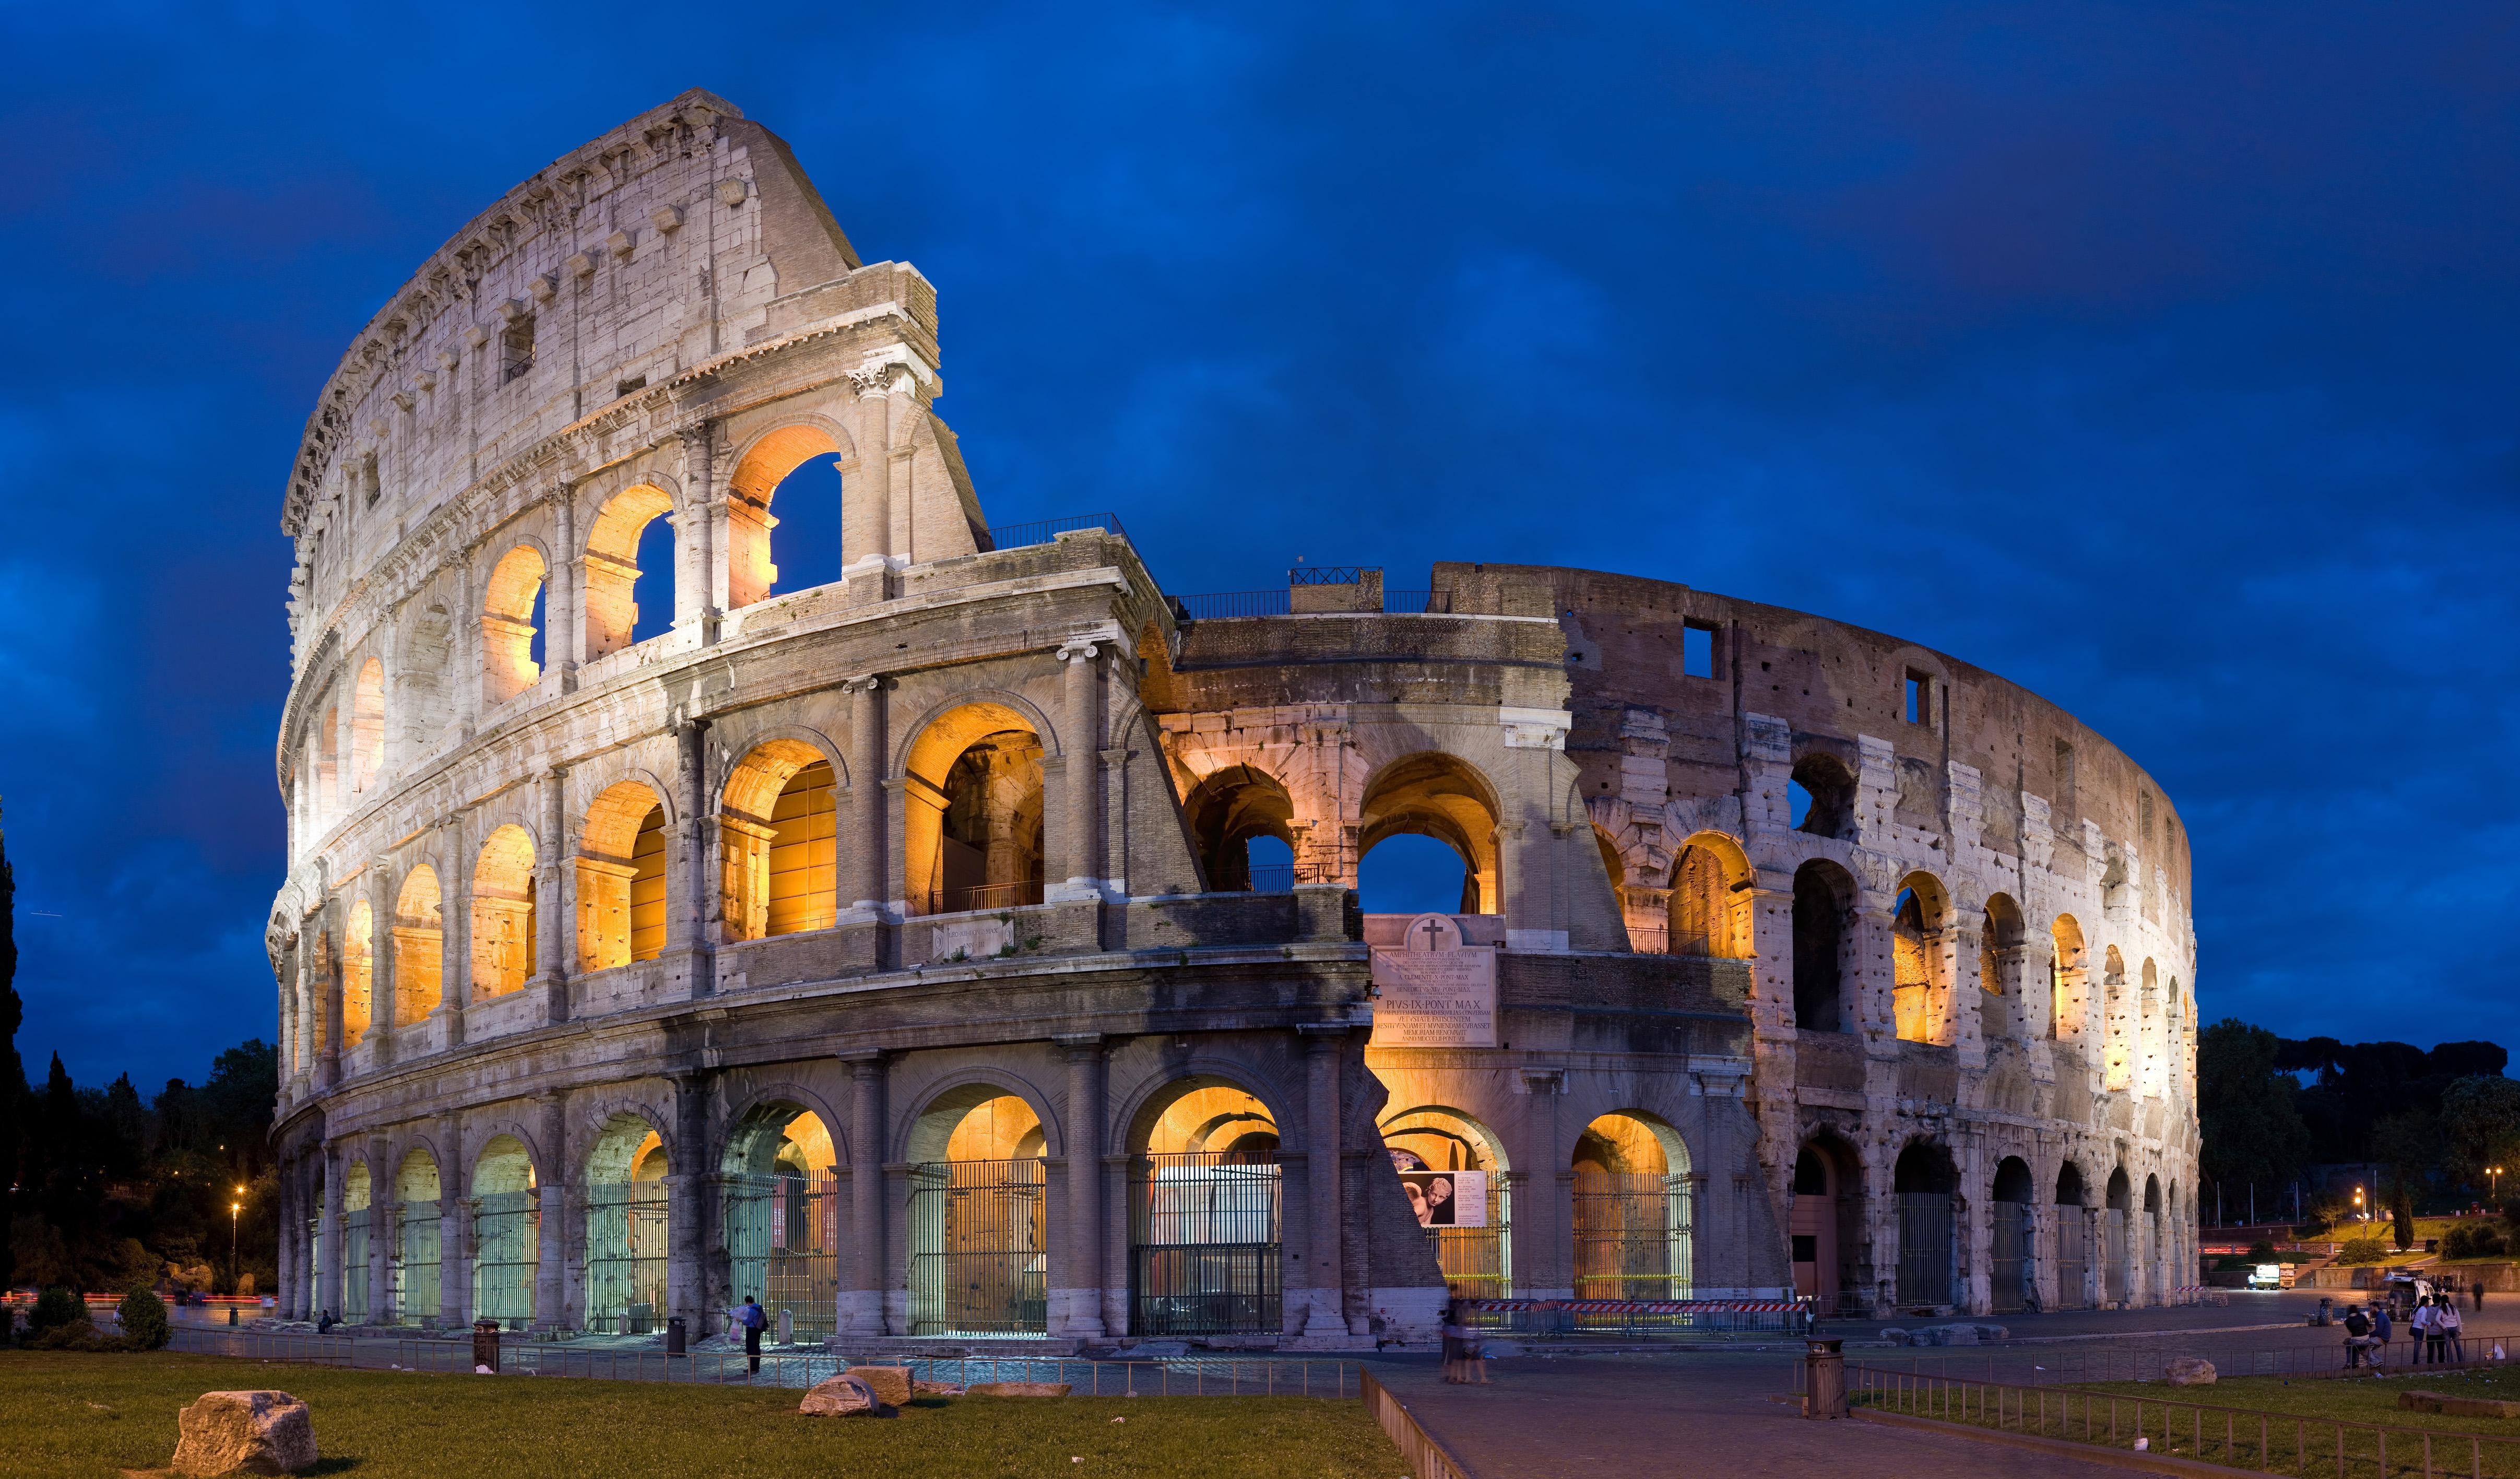 Colosseum_in_Rome_Italy.jpg